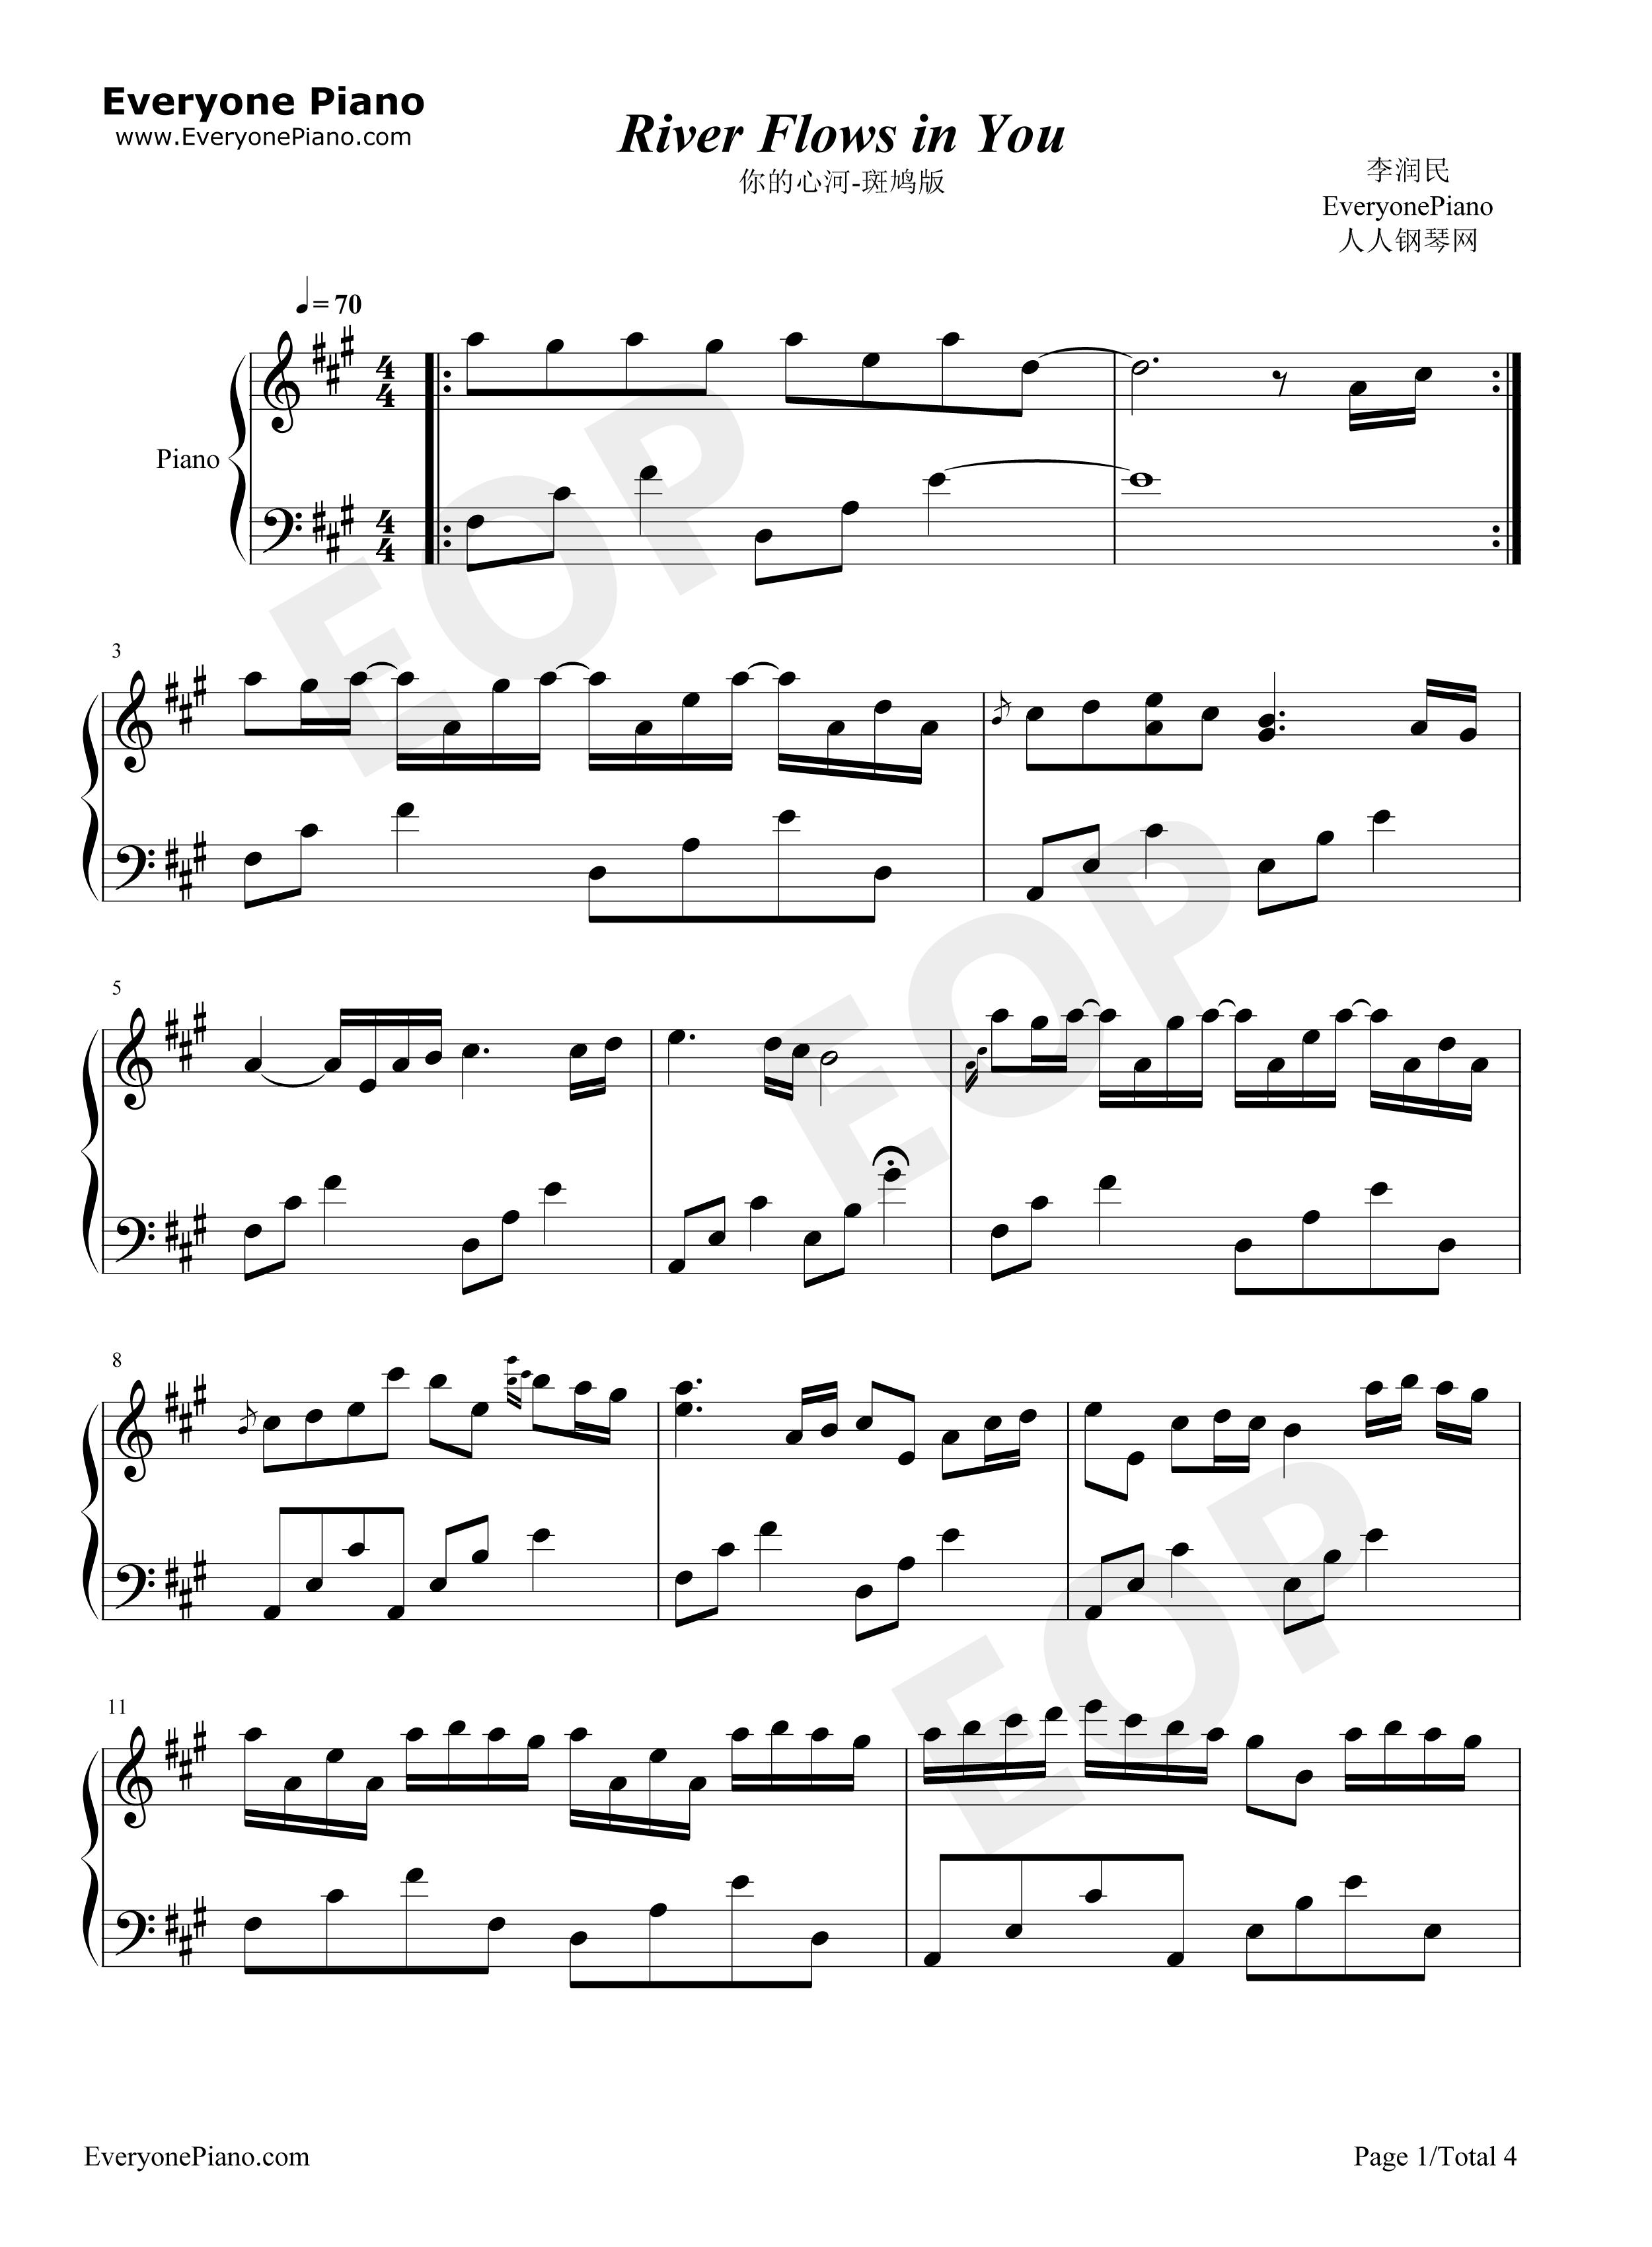 Yiruma - River flows in you piano sheet music | Partituras ...